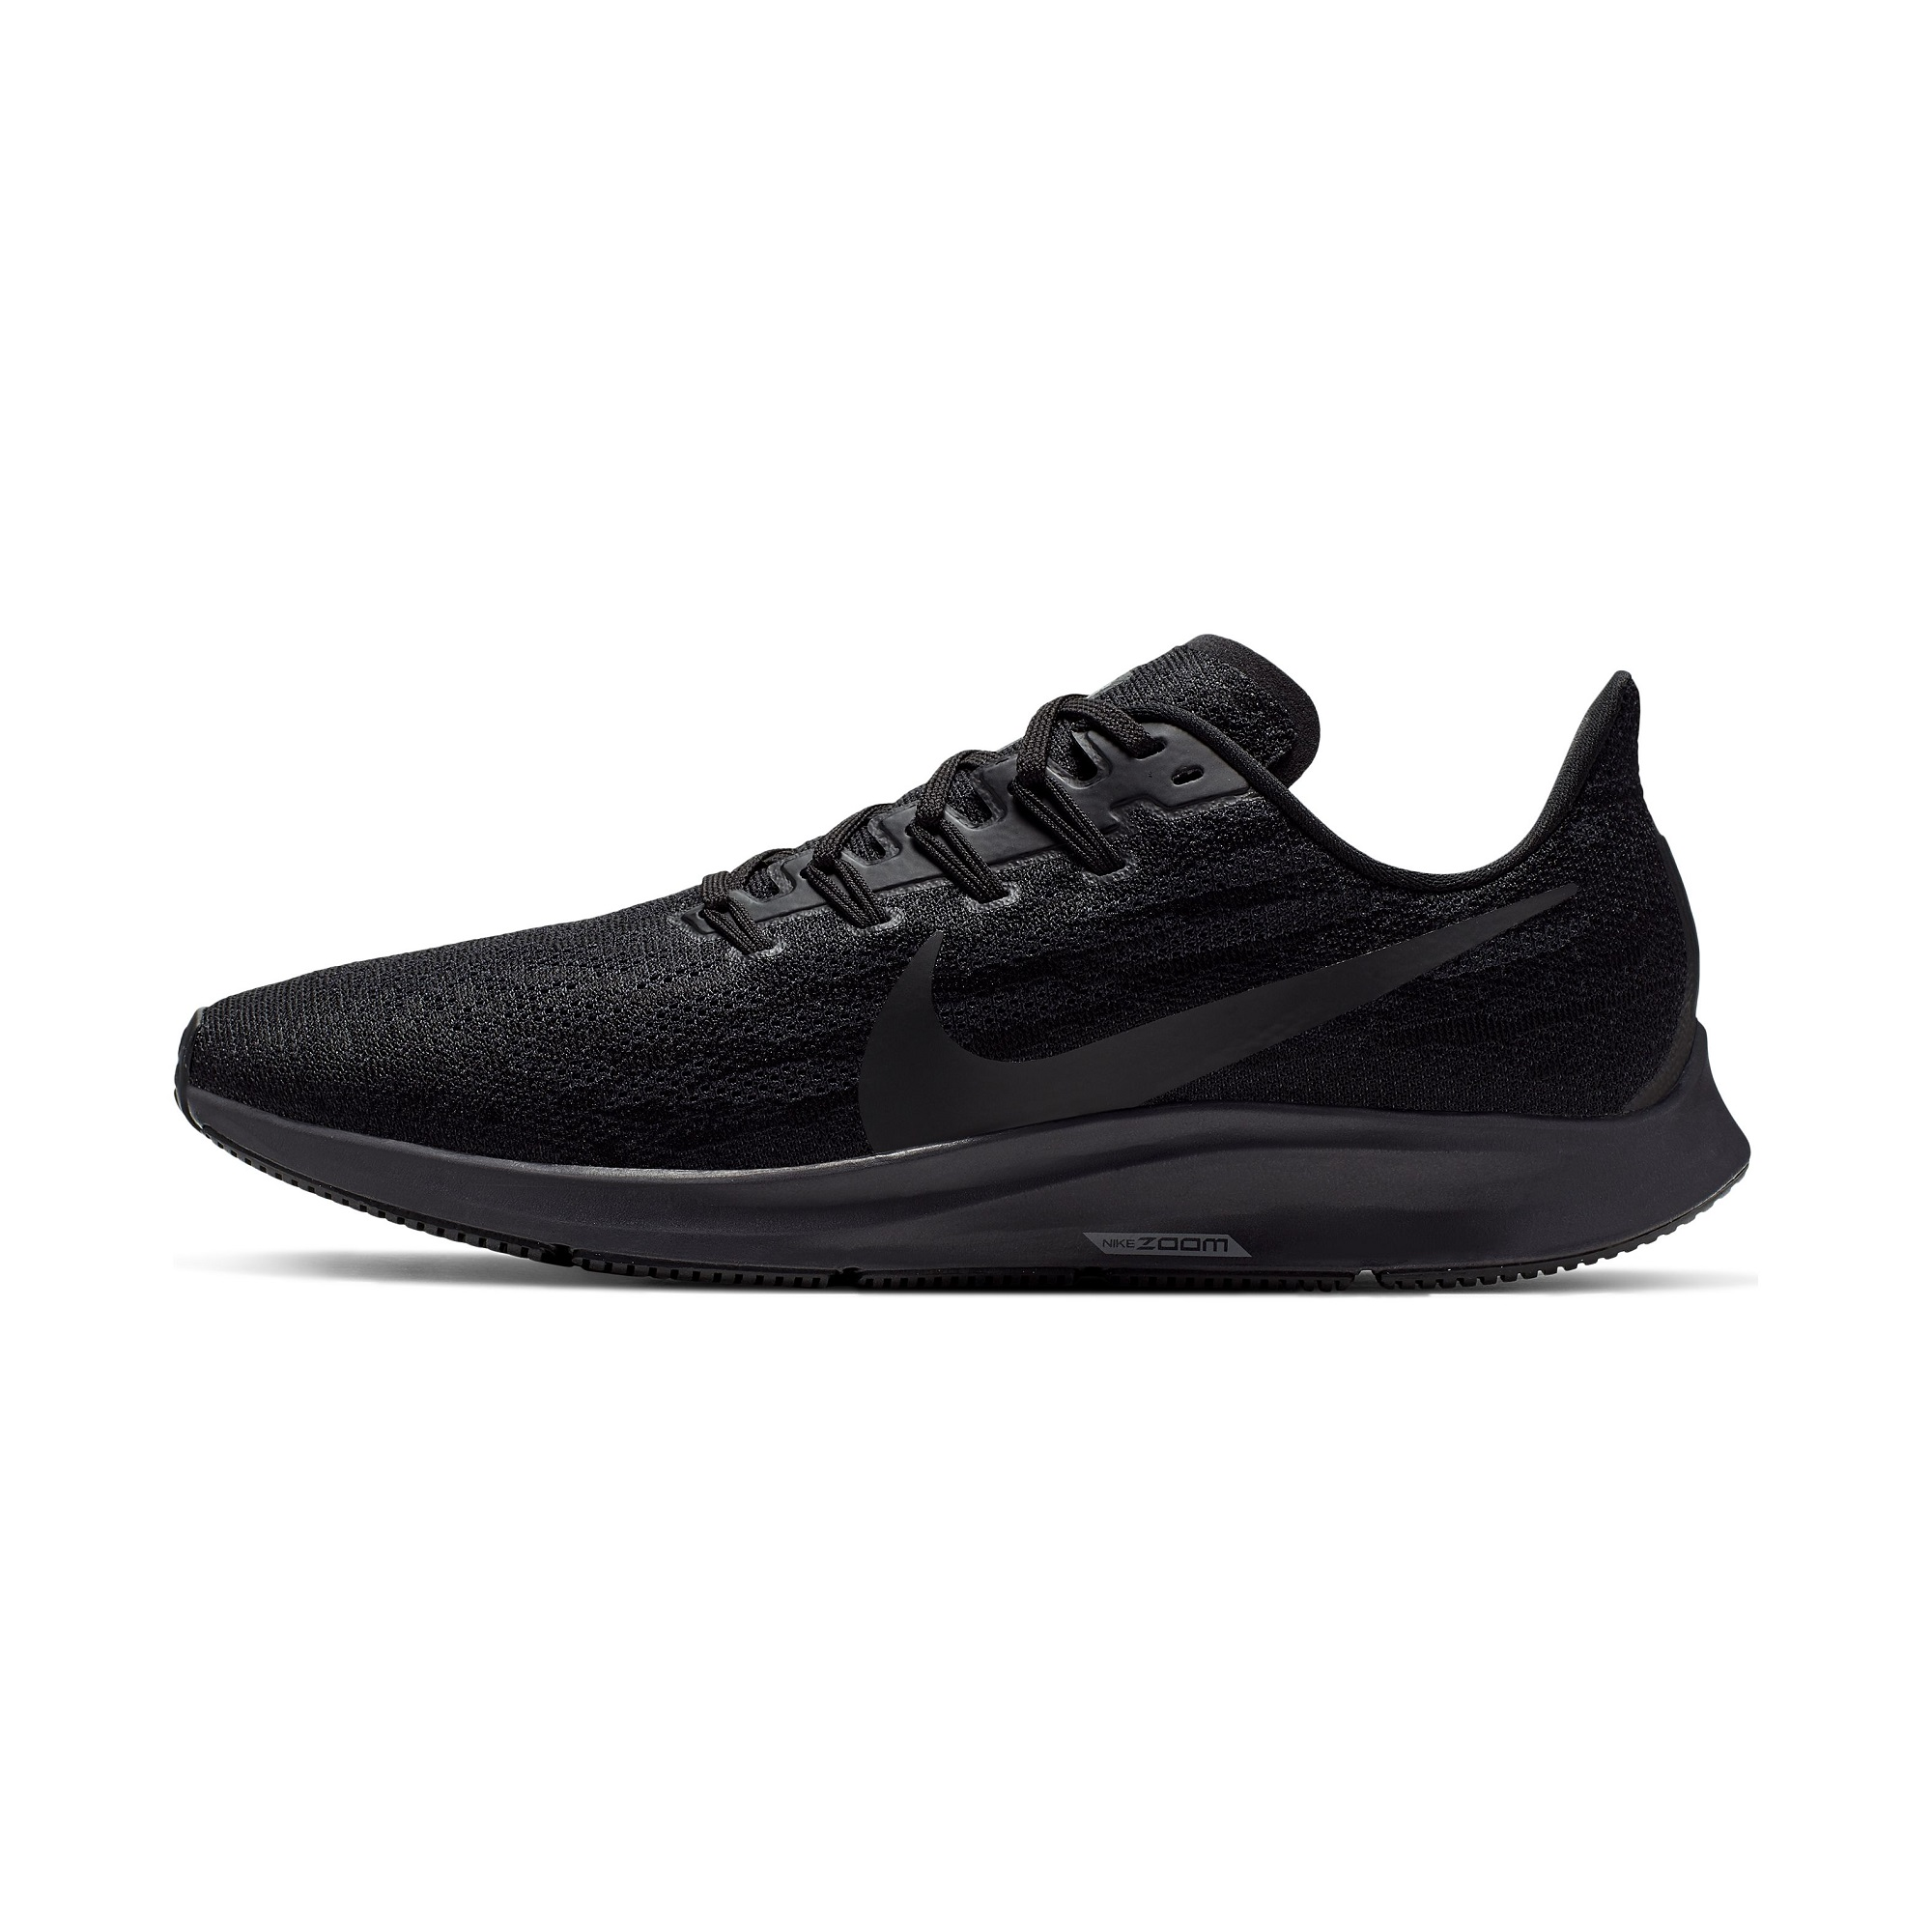 Nike Кроссовки мужские Nike Air Zoom Pegasus 36, размер 47,5